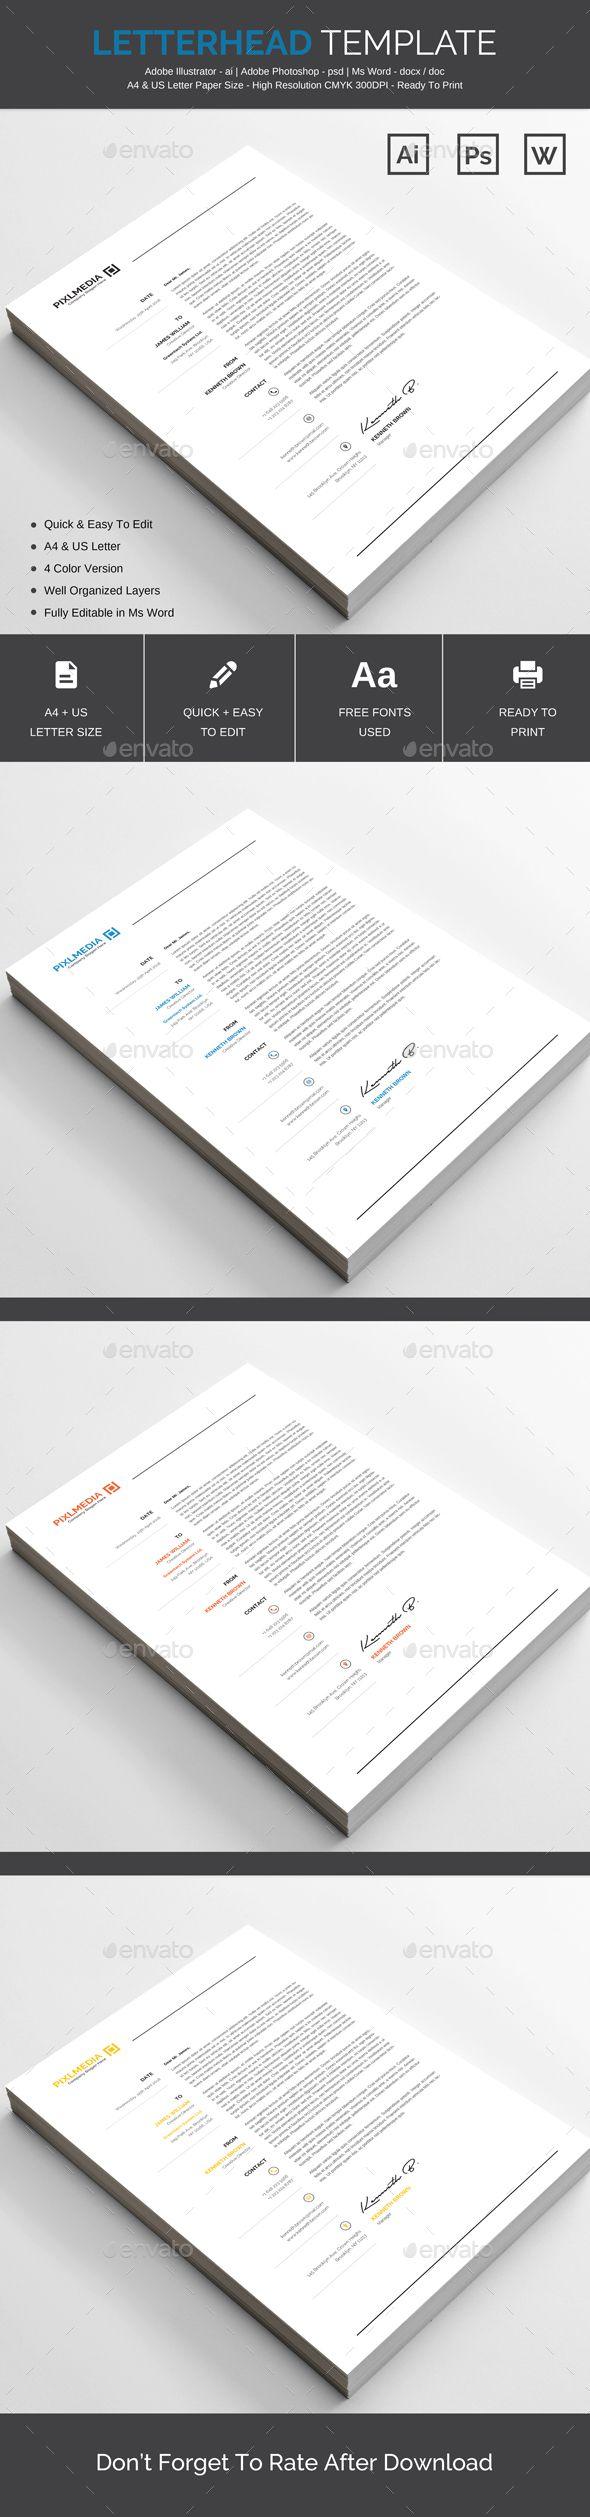 Letterhead pinterest stationery printing print templates and letterhead pinterest stationery printing print templates and letterhead design spiritdancerdesigns Gallery